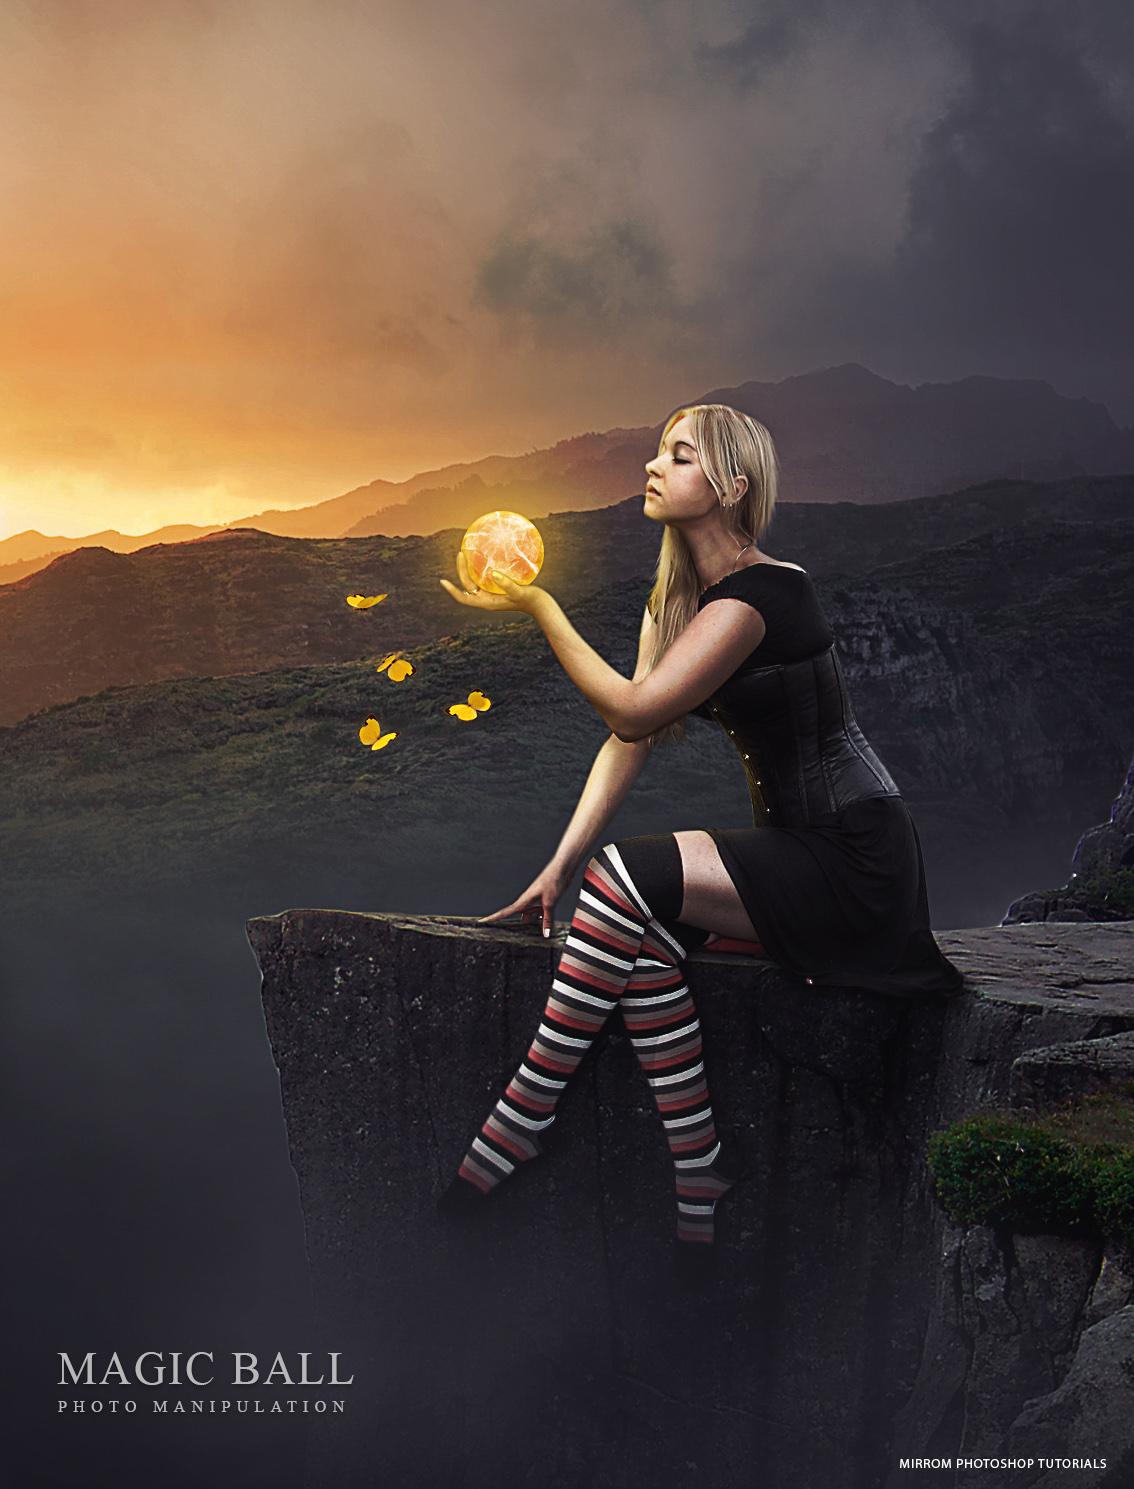 Create an Magic Ball Photo Manipulation In Photoshop